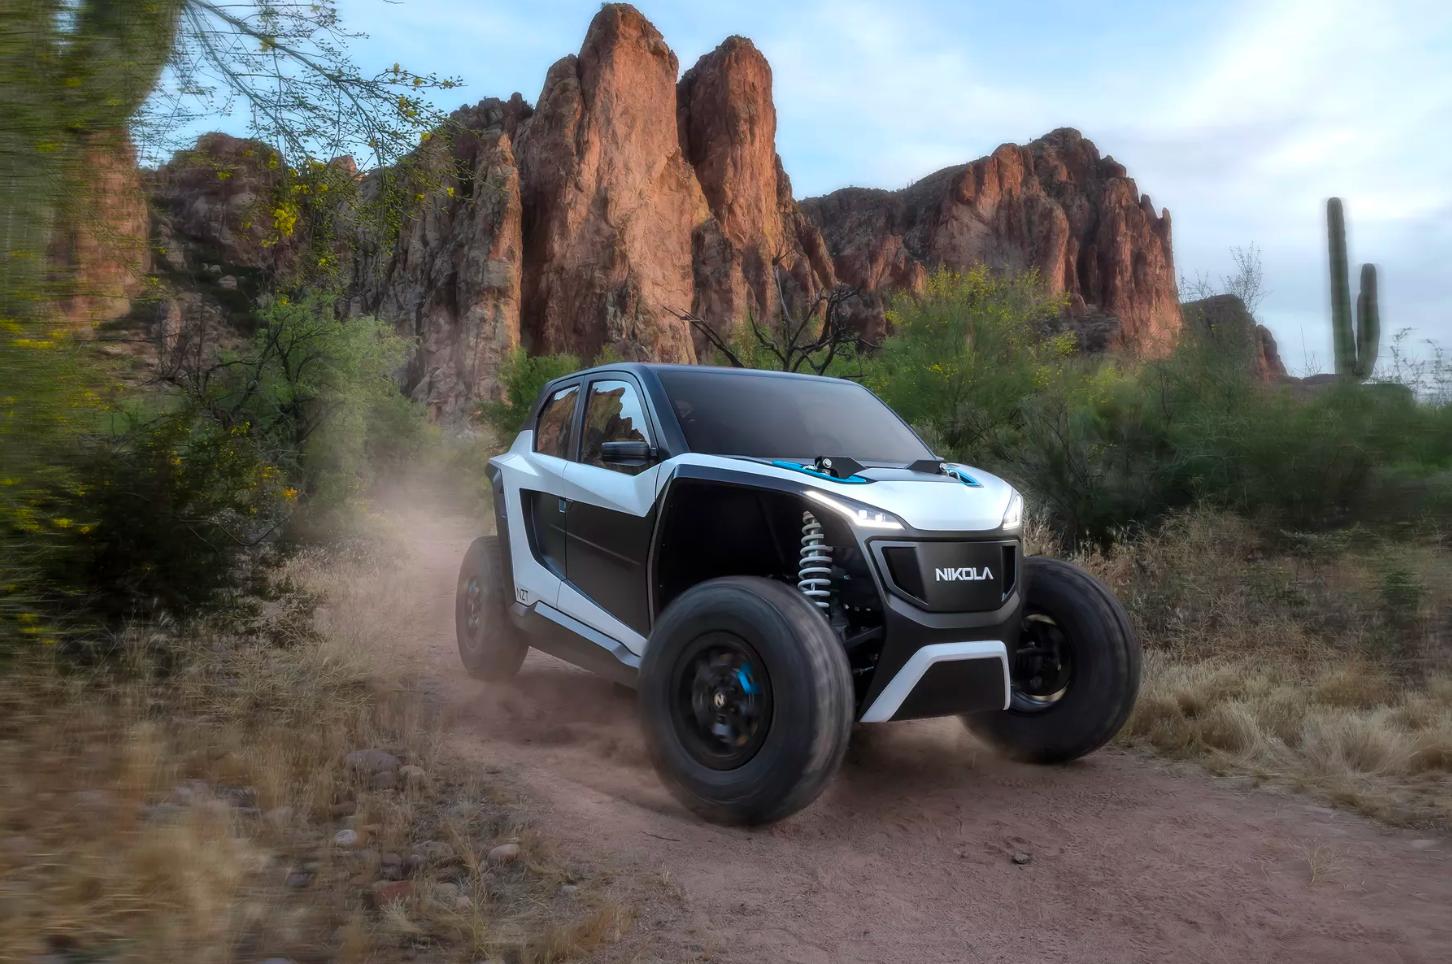 Nikola NZT - A brand new off-road electric vehicle from Nikola ⚡️